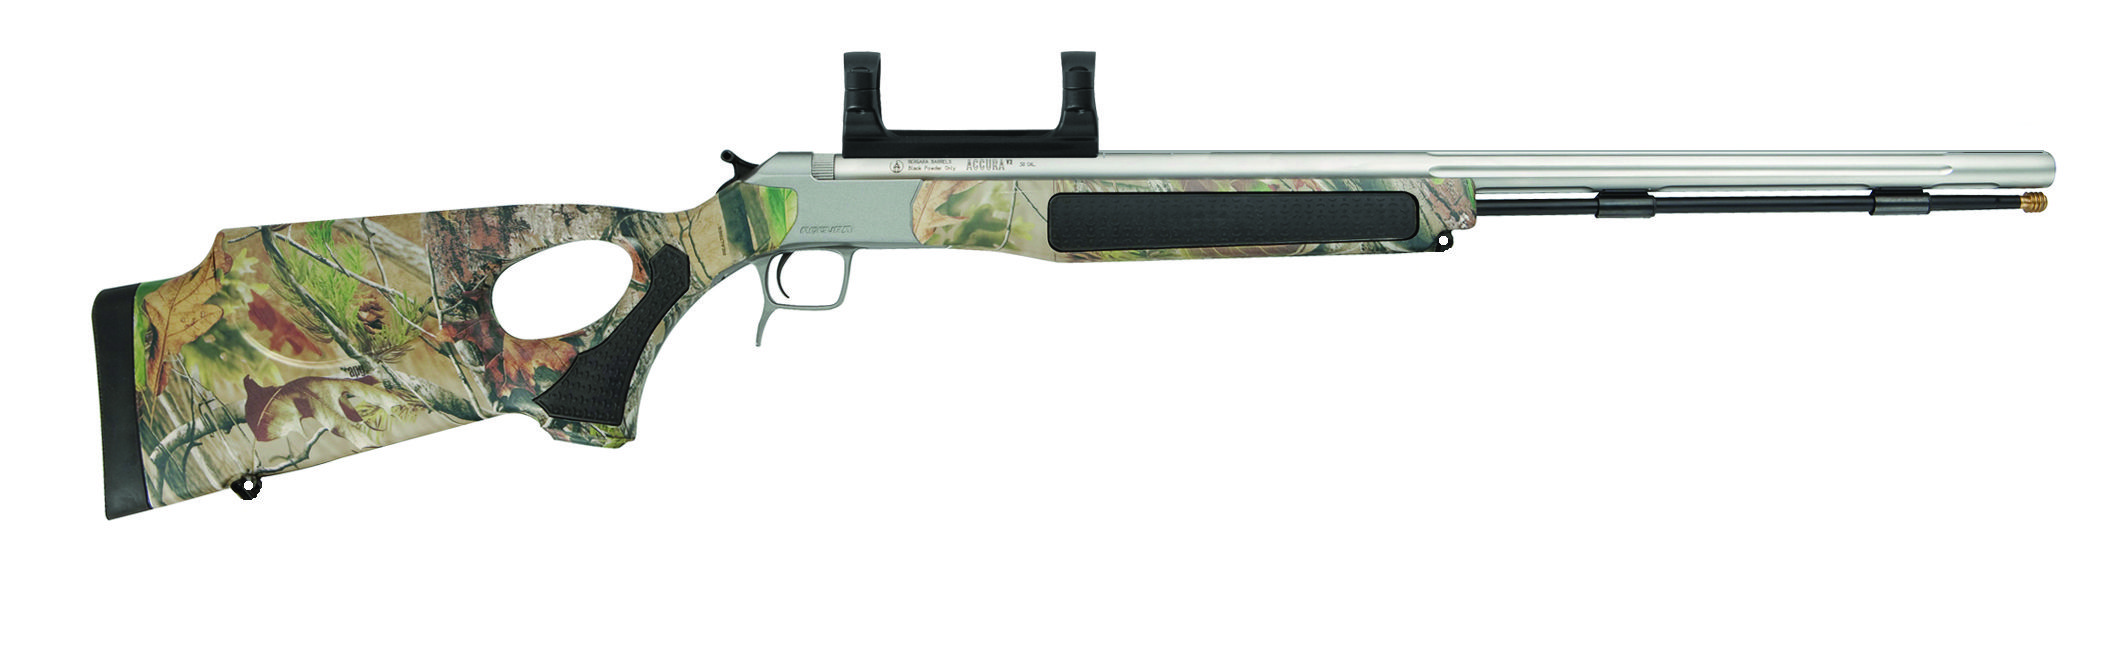 Accura V2 209 Magnum Break-Action Muzzleloader -  50 Cal